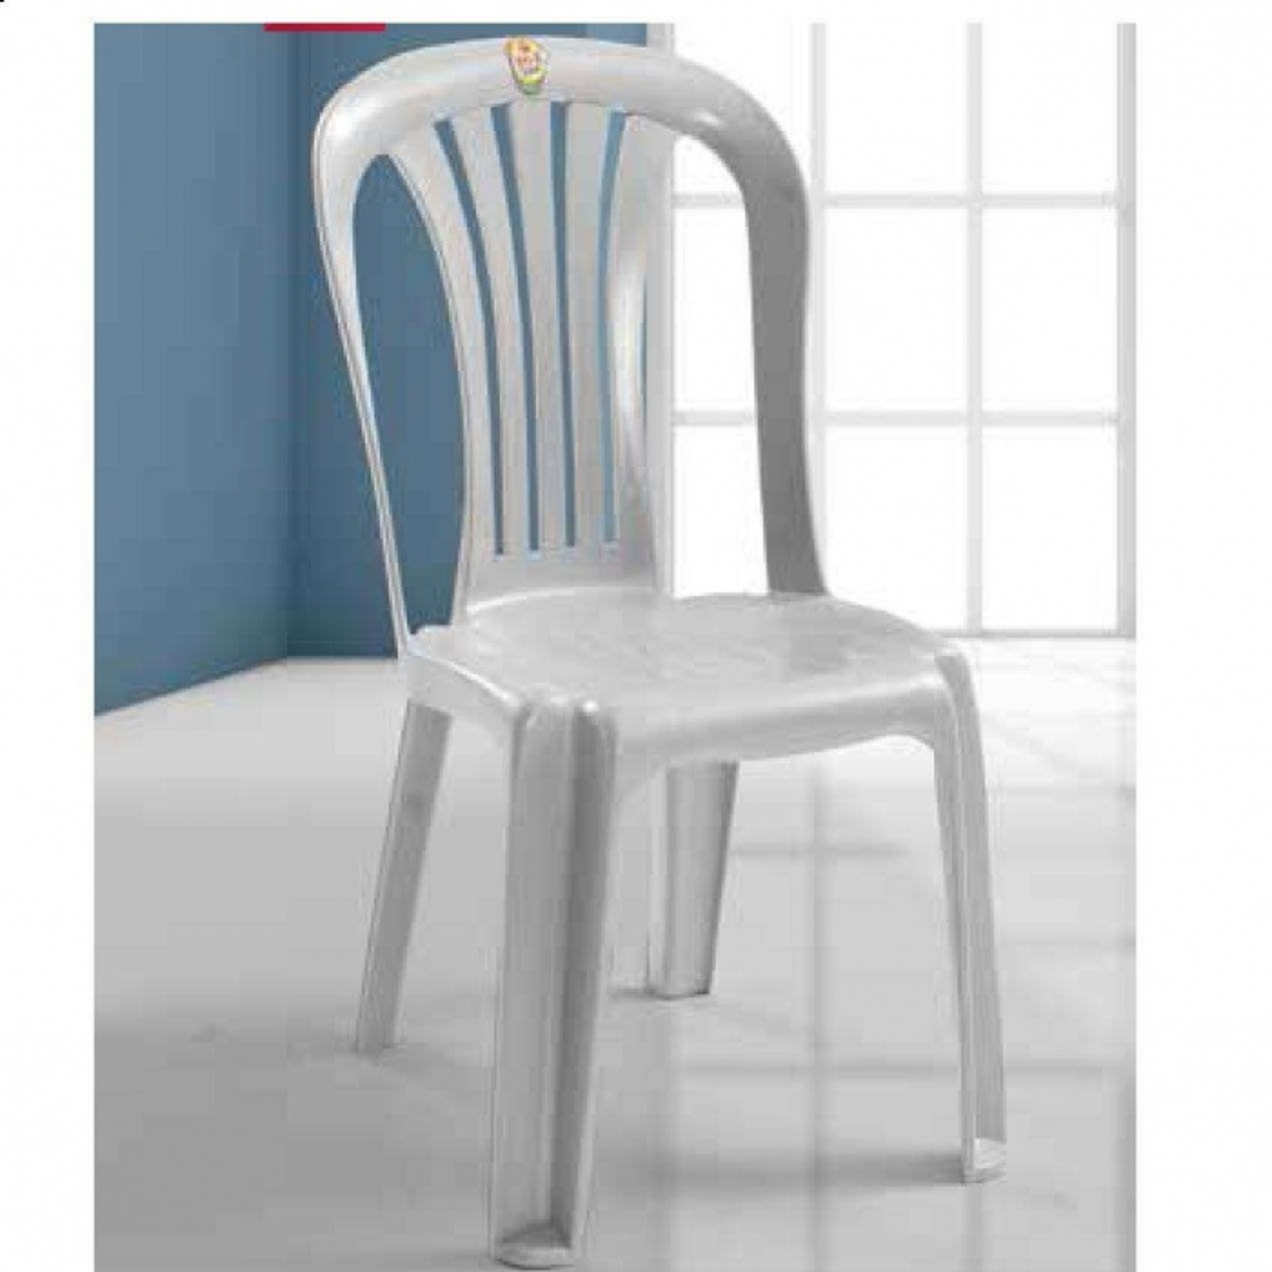 Kolsuz Plastik Bahçe Sandalyesi-4 Adet